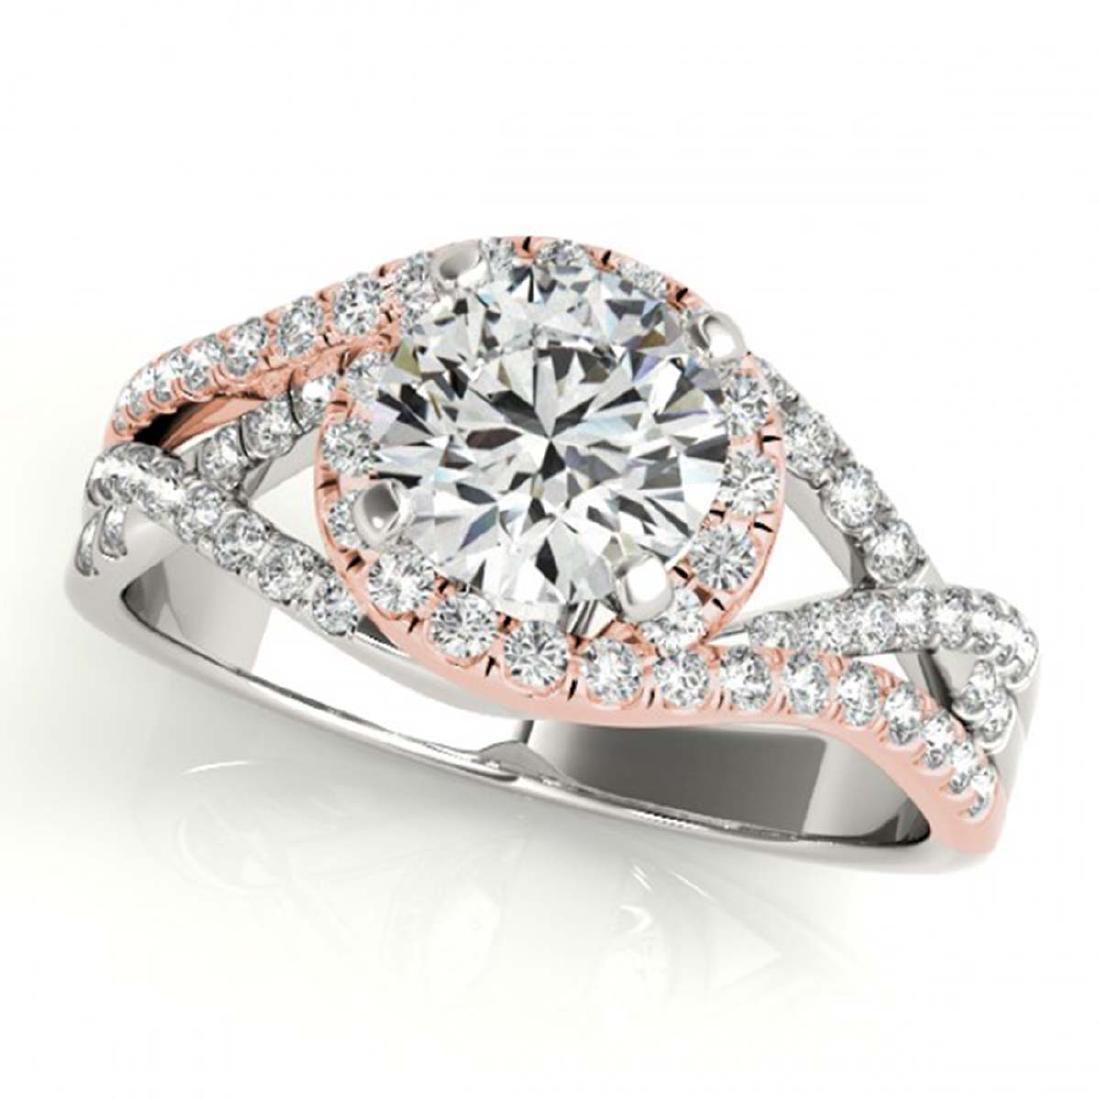 1.50 ctw VS/SI Diamond Solitaire Halo Ring 18K White &